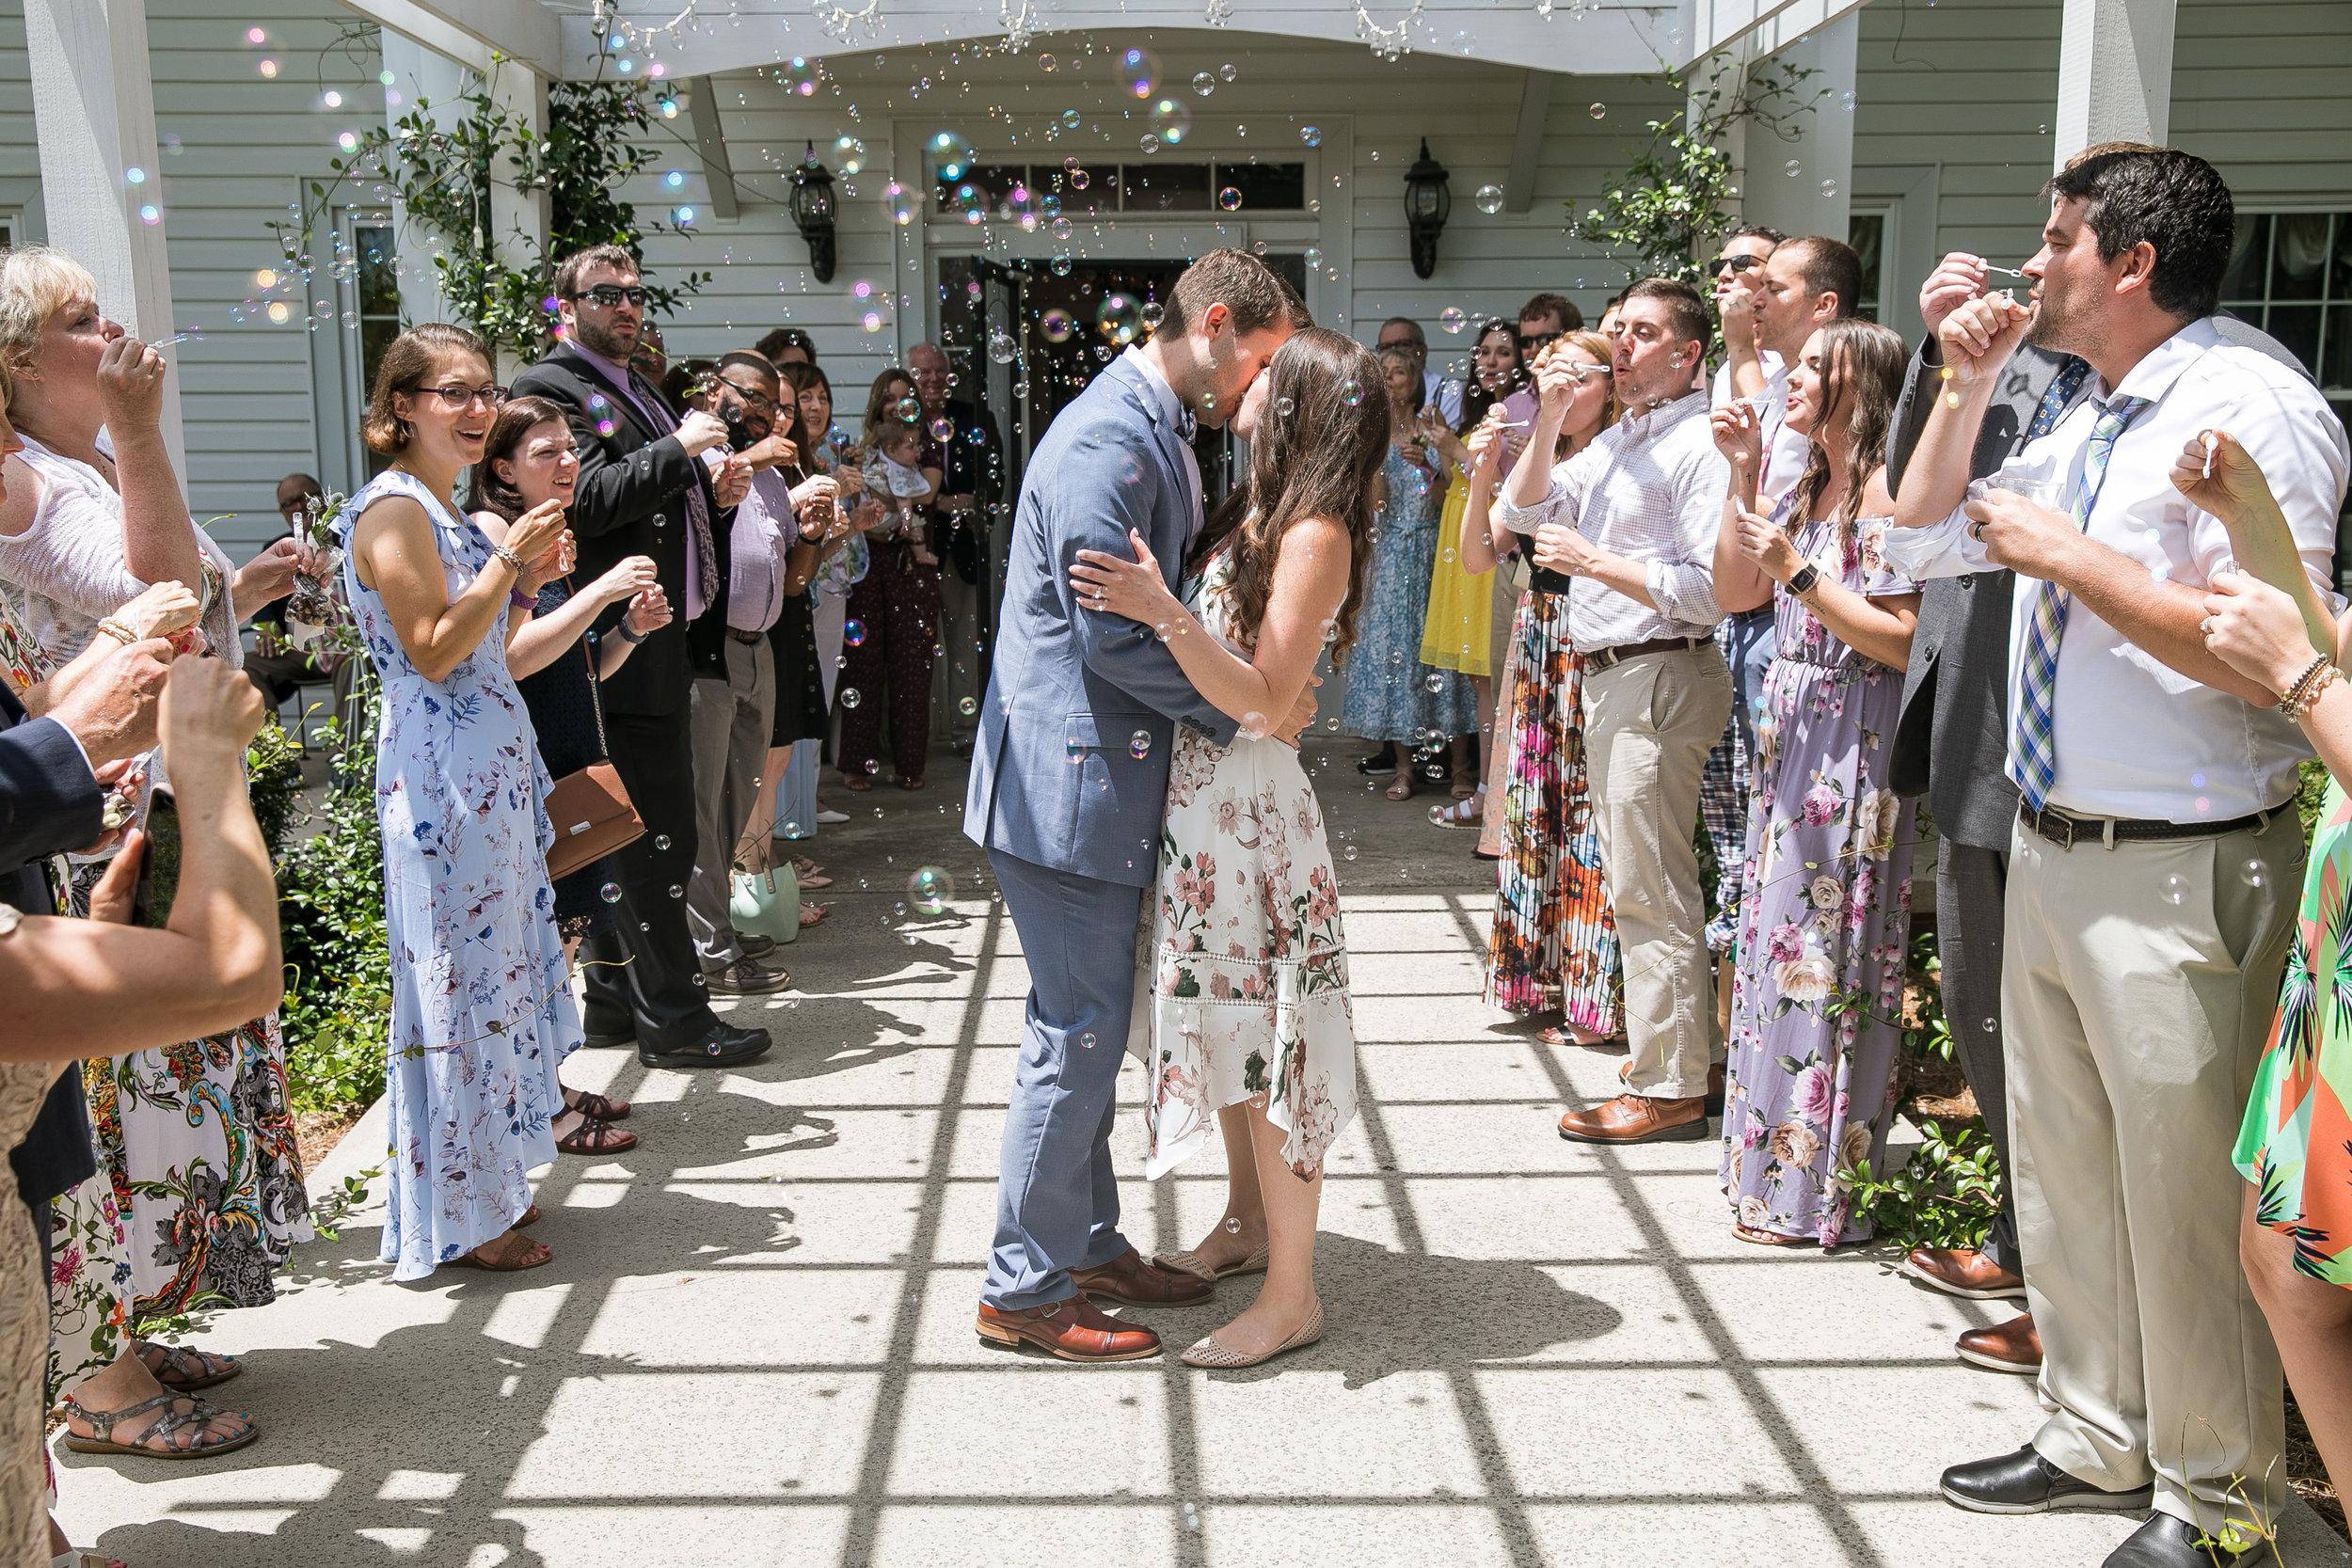 wedding-369 - Copy.JPG